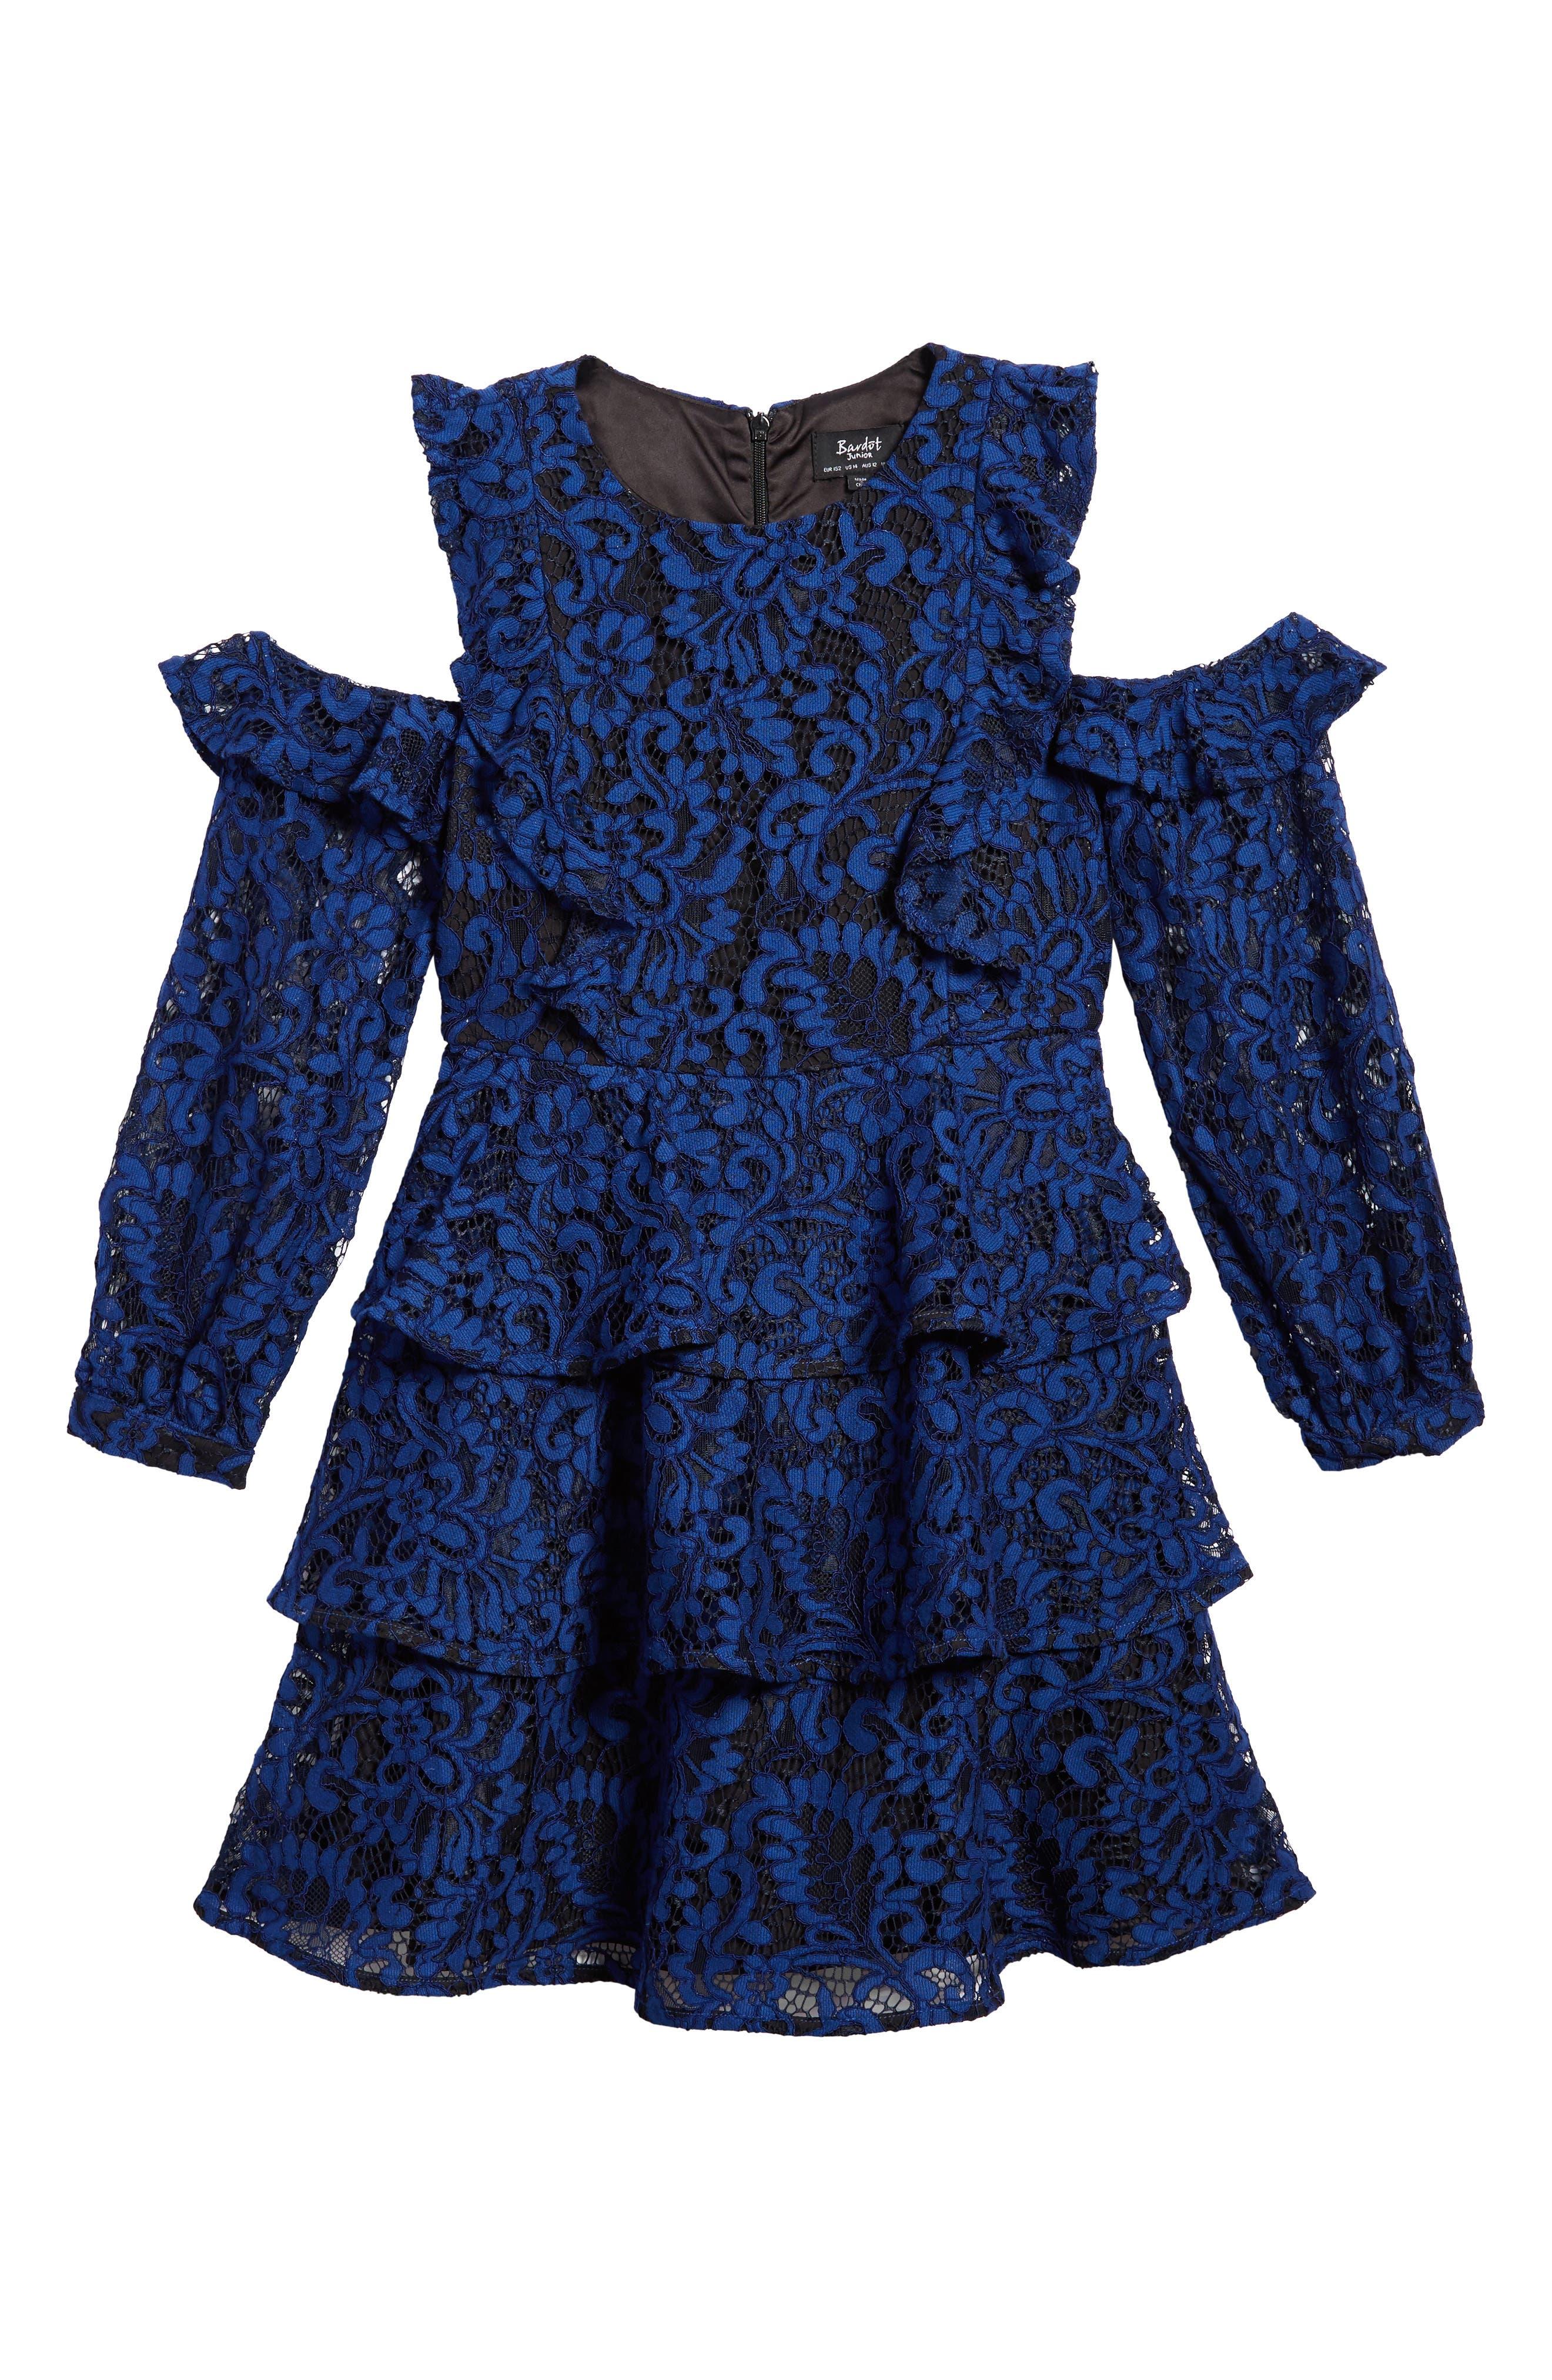 Main Image - Bardot Junior Ruffle Lace Cold Shoulder Dress (Big Girls)